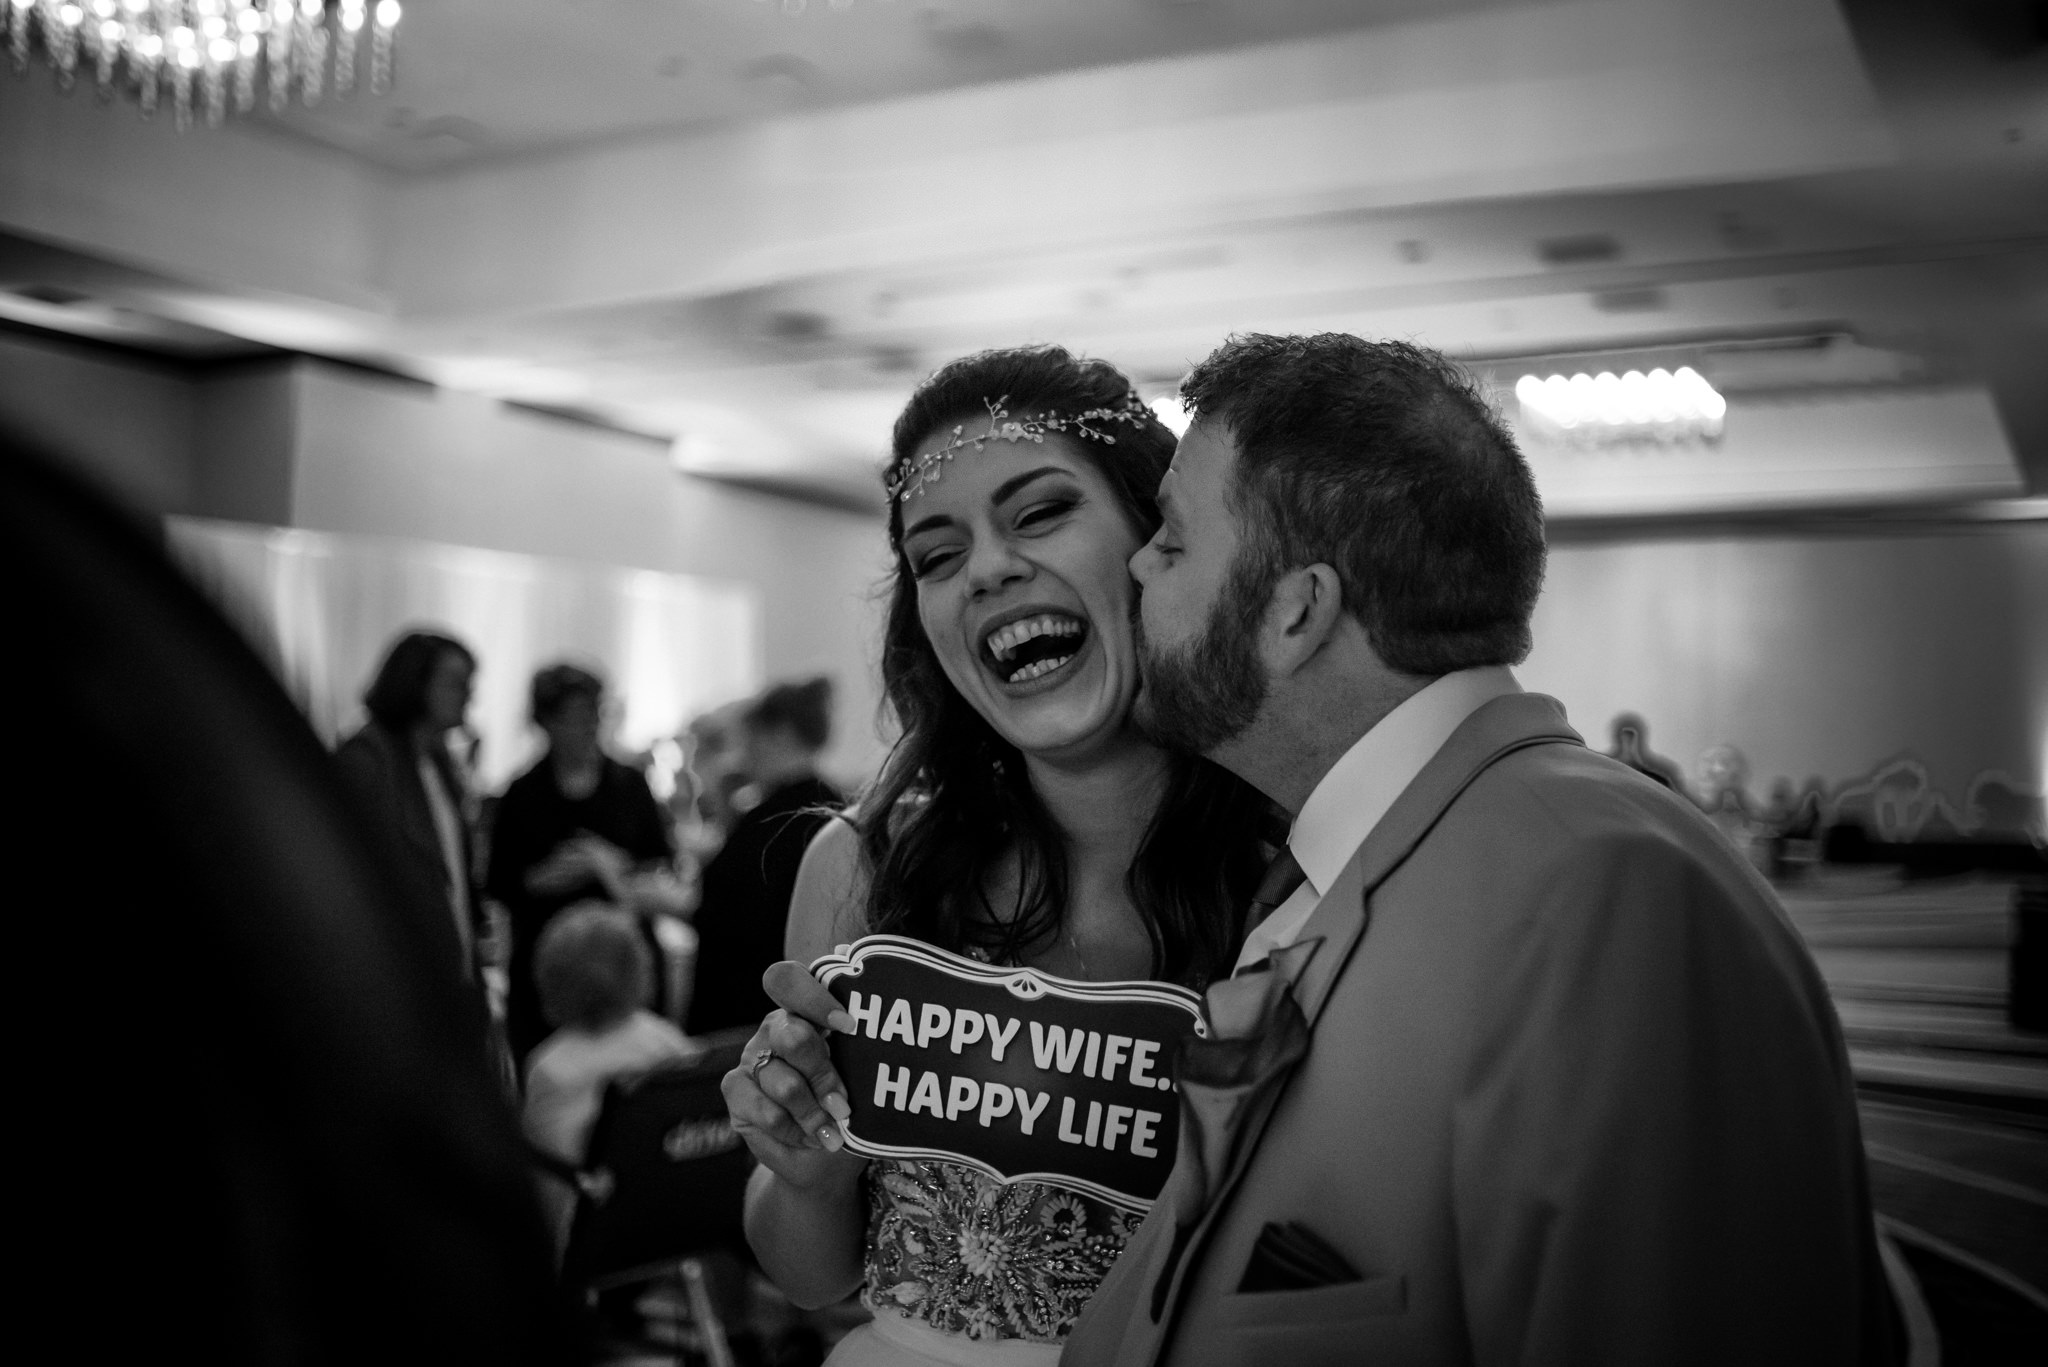 HILTON-OMAHA-WEDDING-PHOTOGRAPHER-JM-STUDIOS-OMAHA-LIV-BRICE-038.jpg